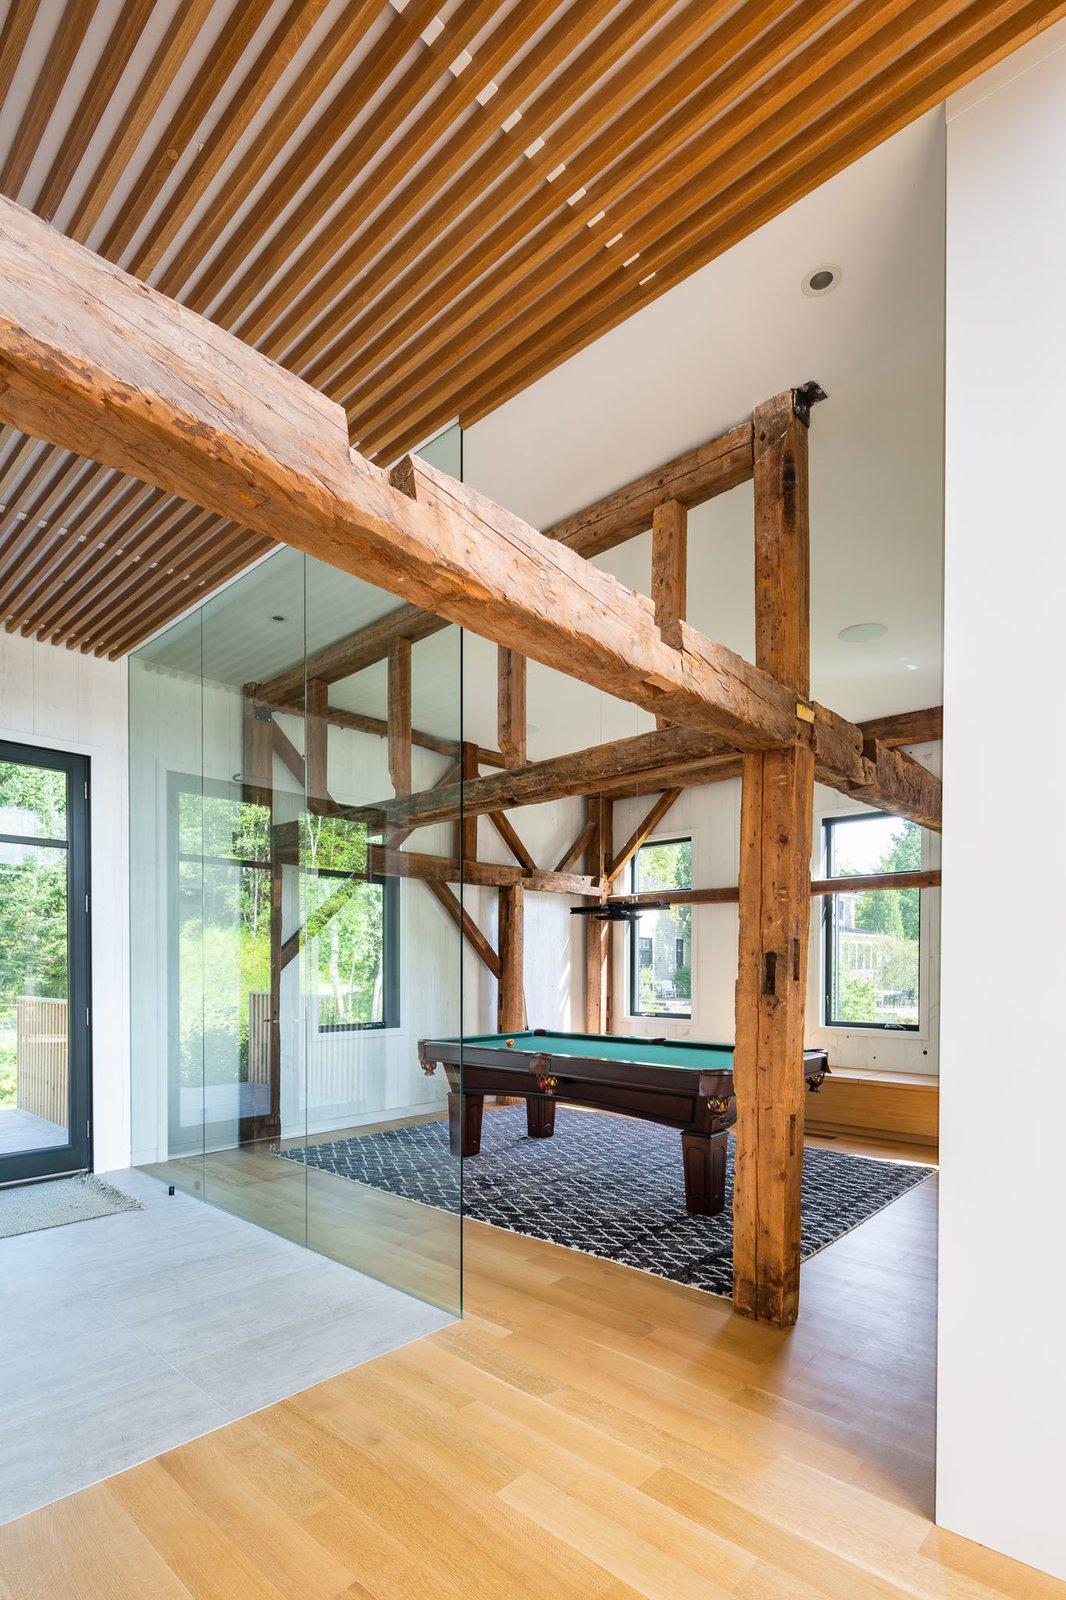 Living Room, Bench, Ceiling Lighting, and Medium Hardwood Floor  The Barn